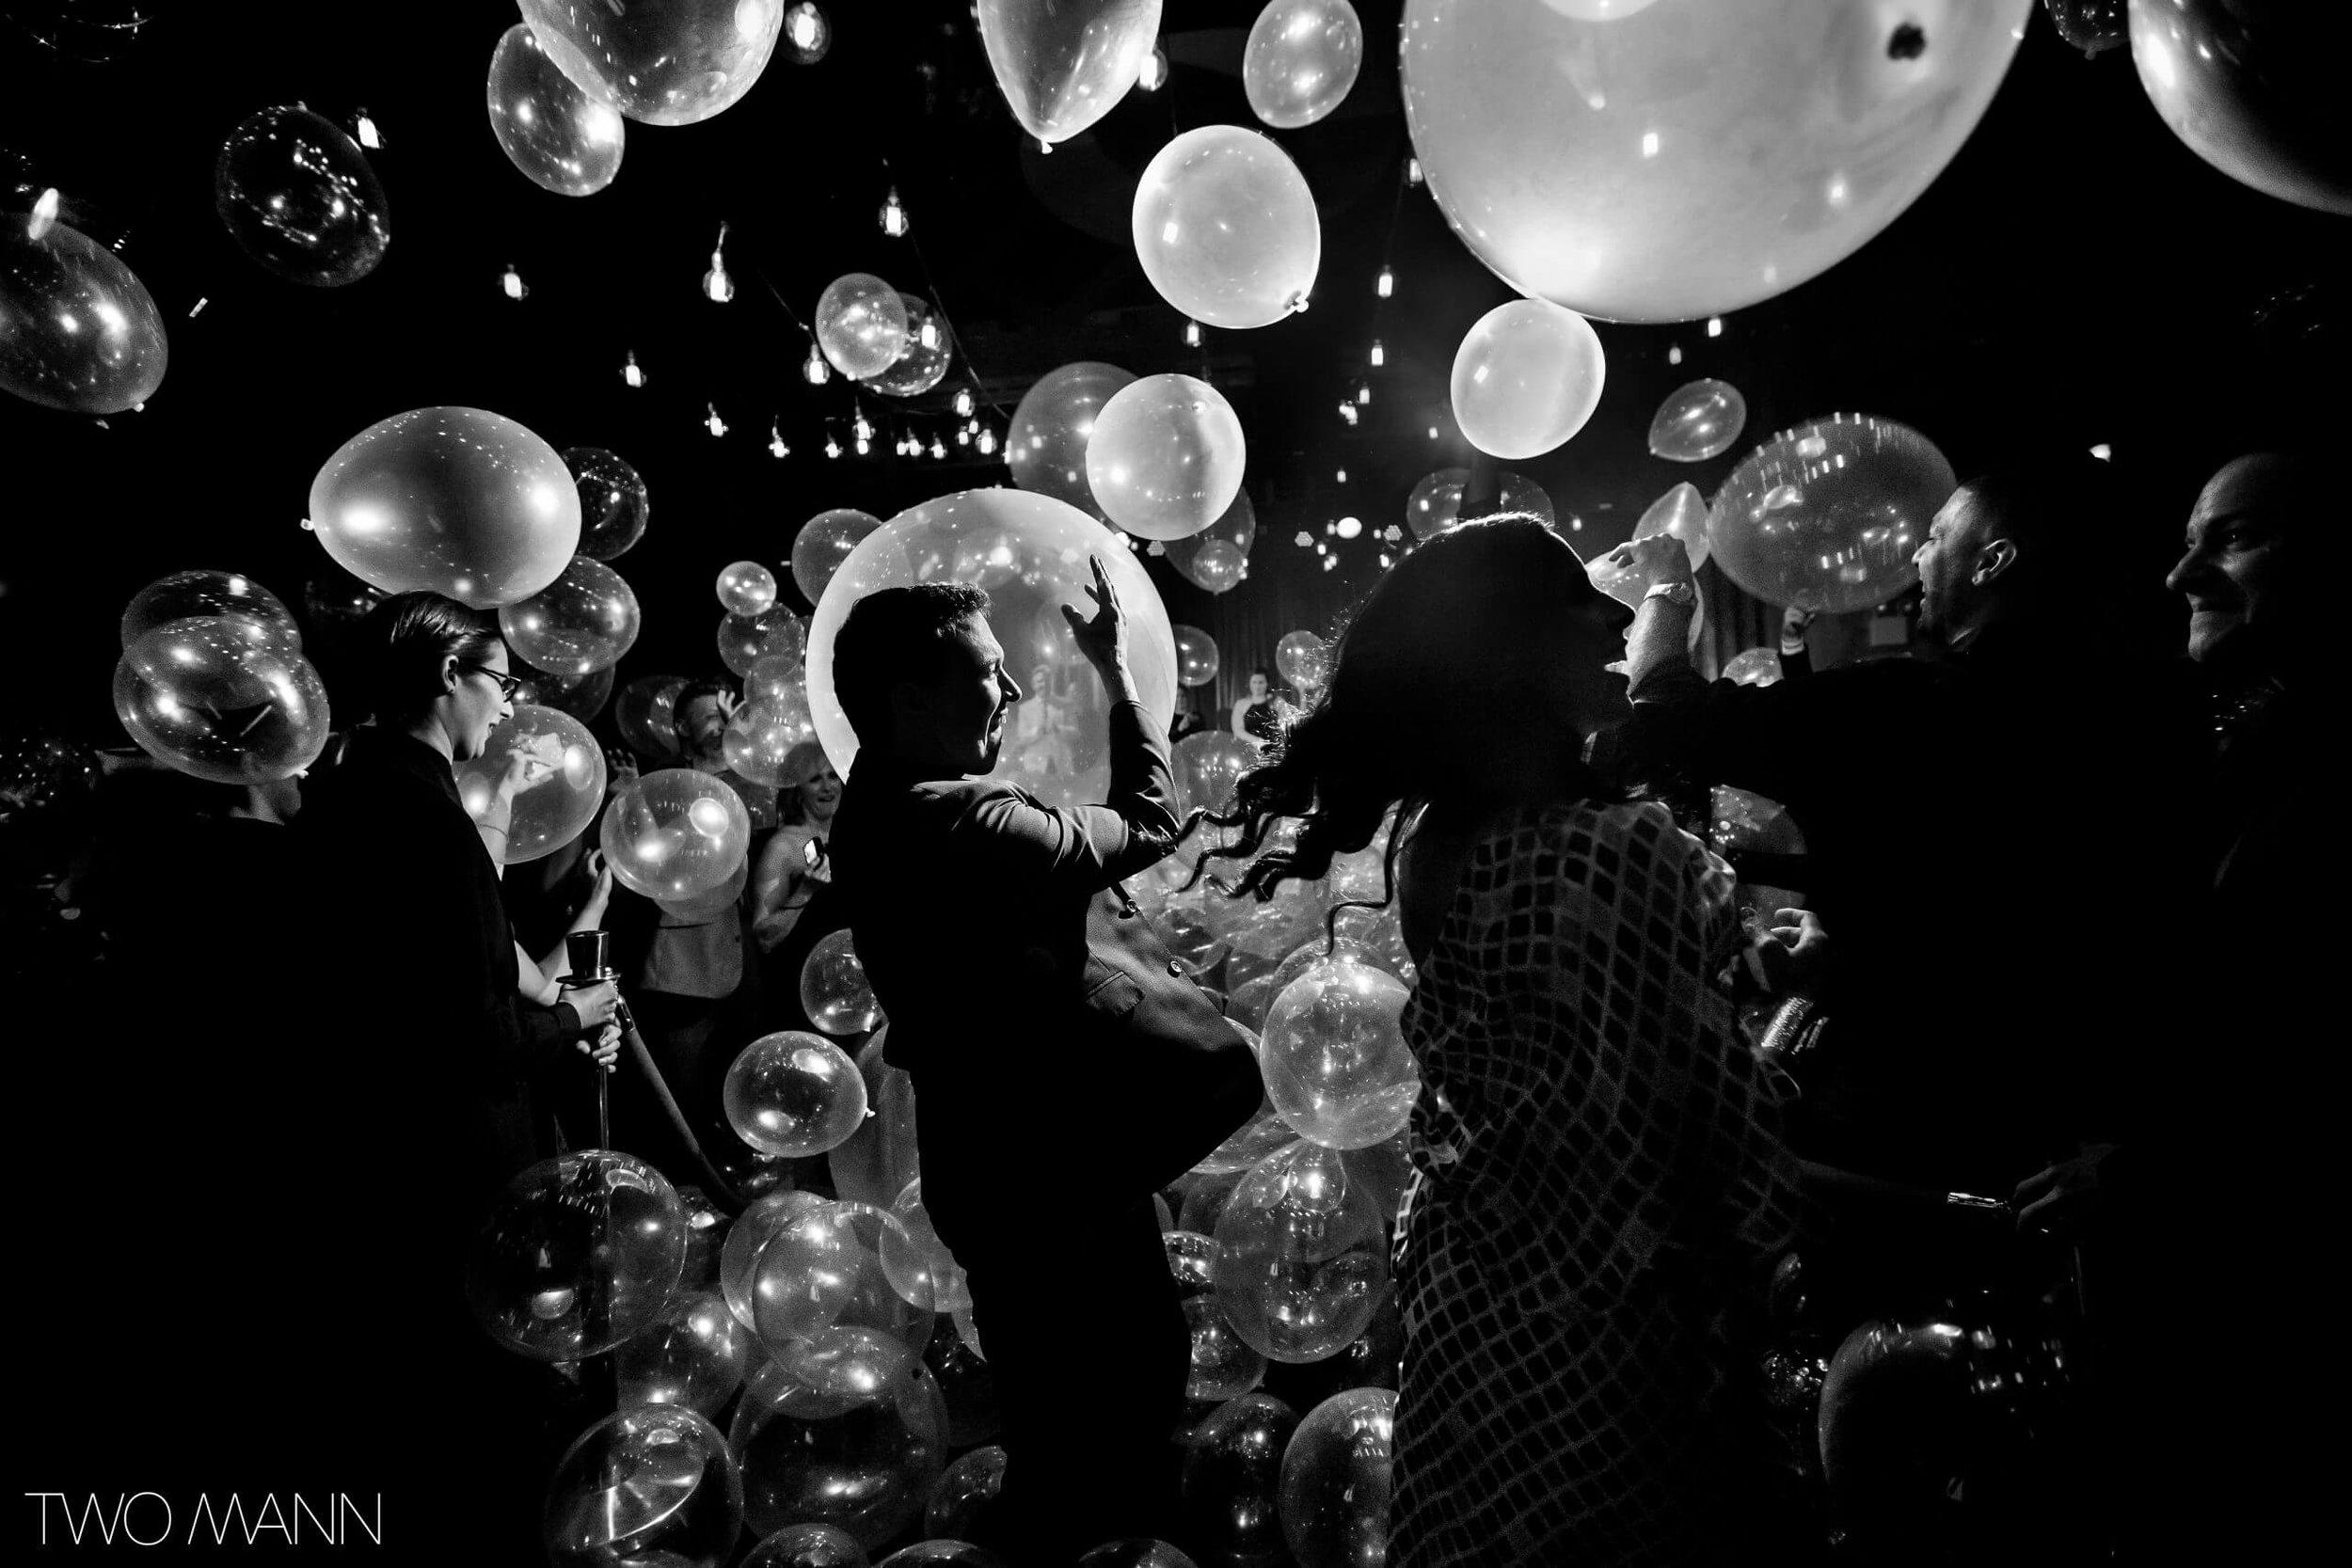 Two-Mann-Studios-Worlds-Best-Wedding-Photography-Best-of-2016-026-2560x1707.jpg